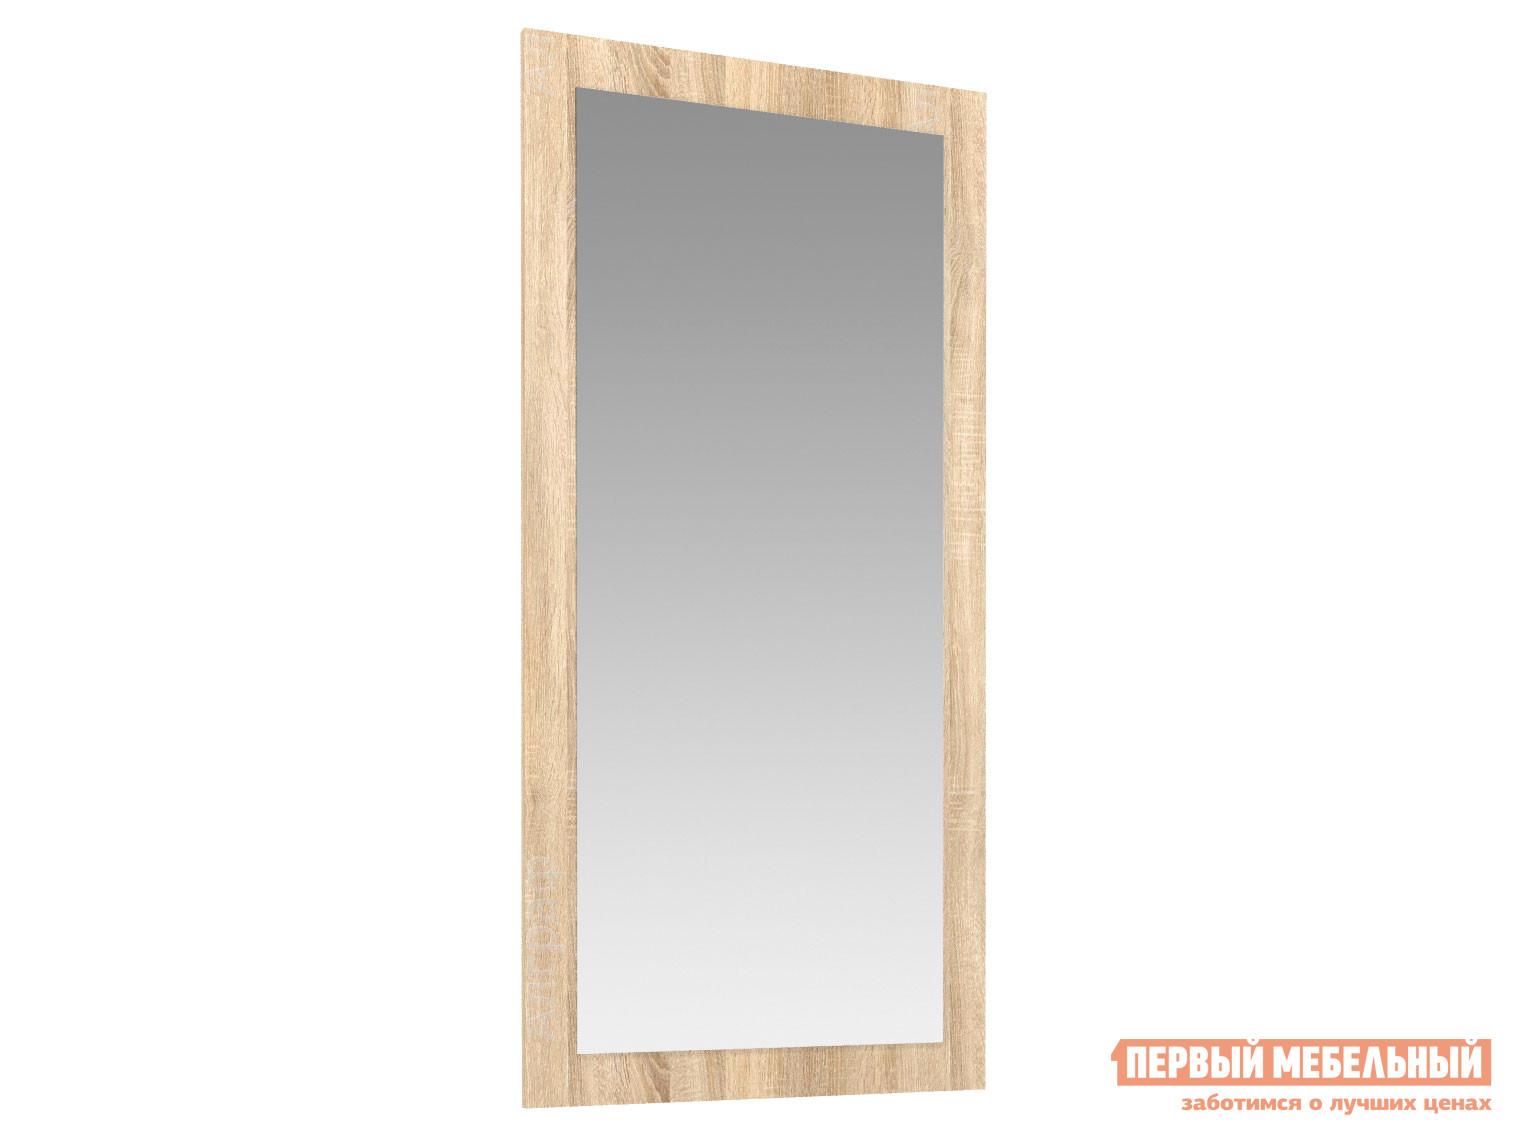 Настенное зеркало Первый Мебельный Настенное зеркало Оливия НМ 040.49 зеркало настенное home philosophy male collection 70379